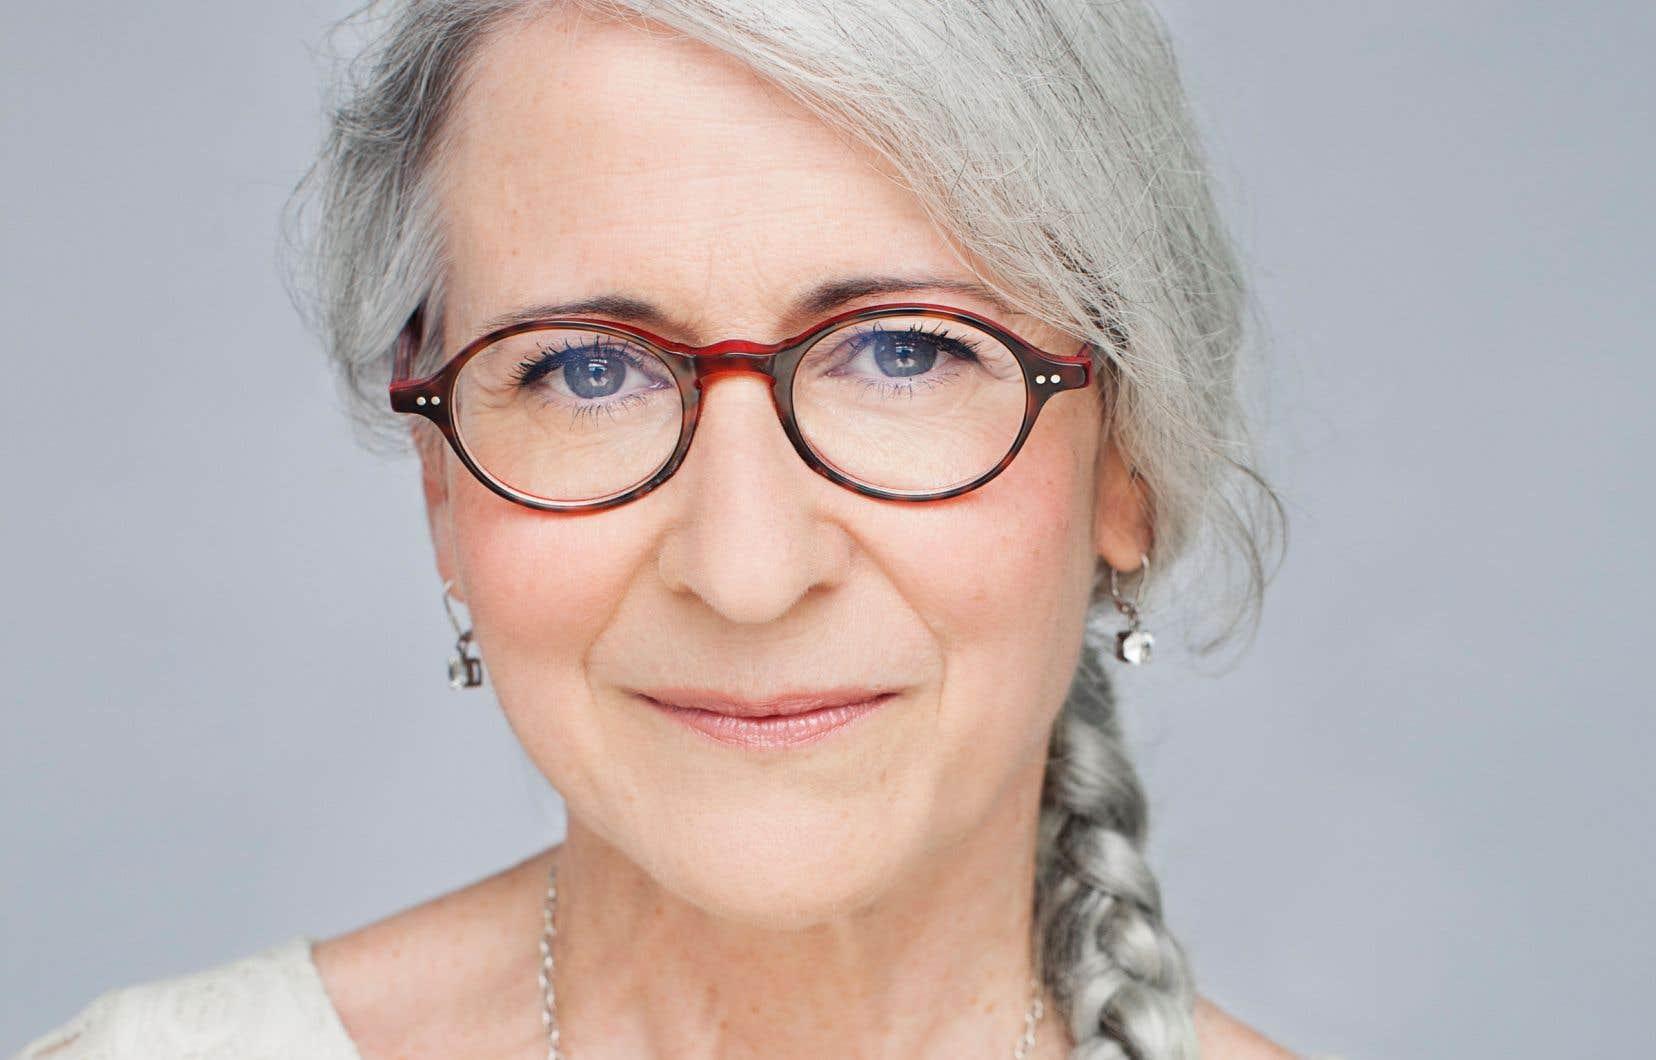 L'autrice Martine Desjardins